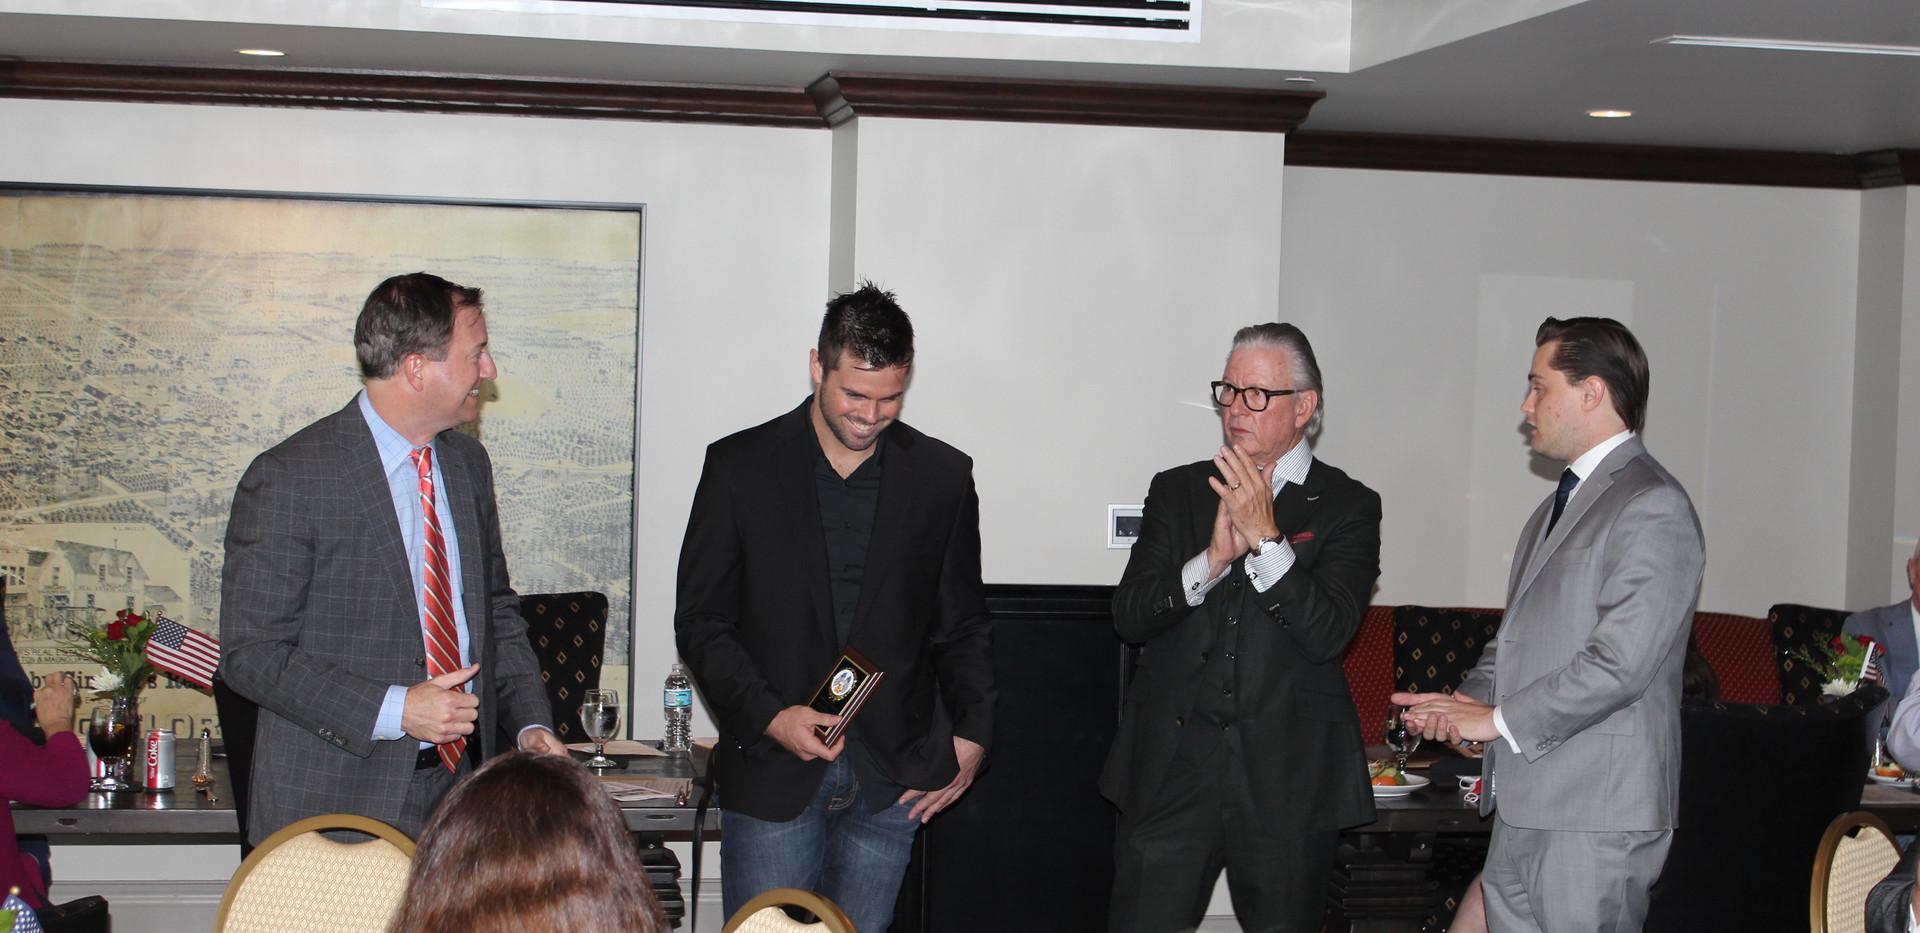 Francisco Gonzalez, Max Dunley, Craig Delongy, Marshall Swanson